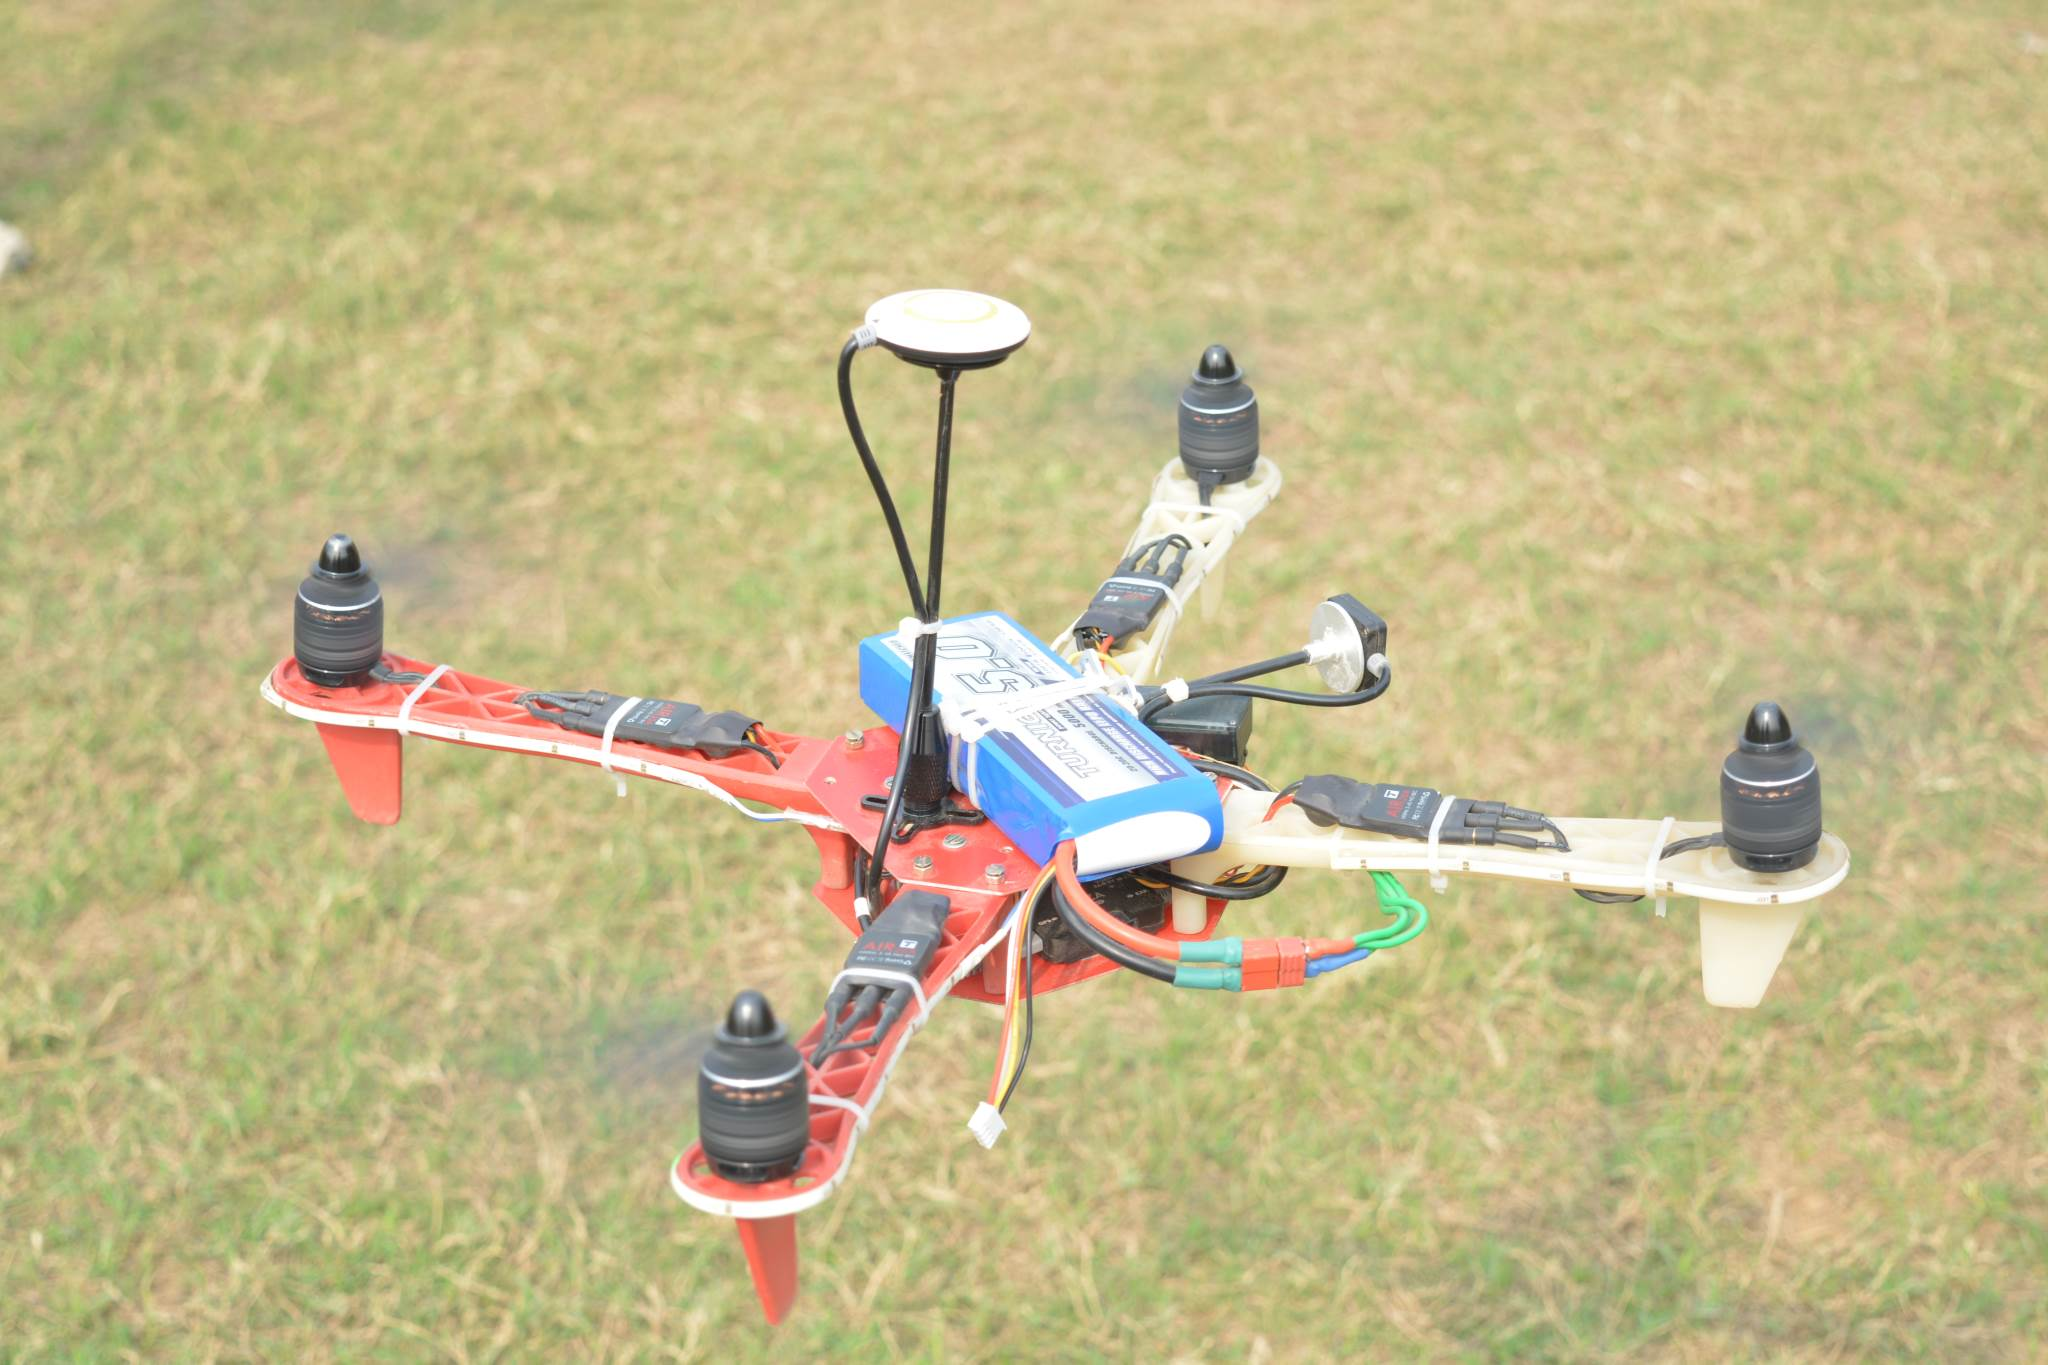 DJI Naza Quadcopter by Arnab Kumar Das